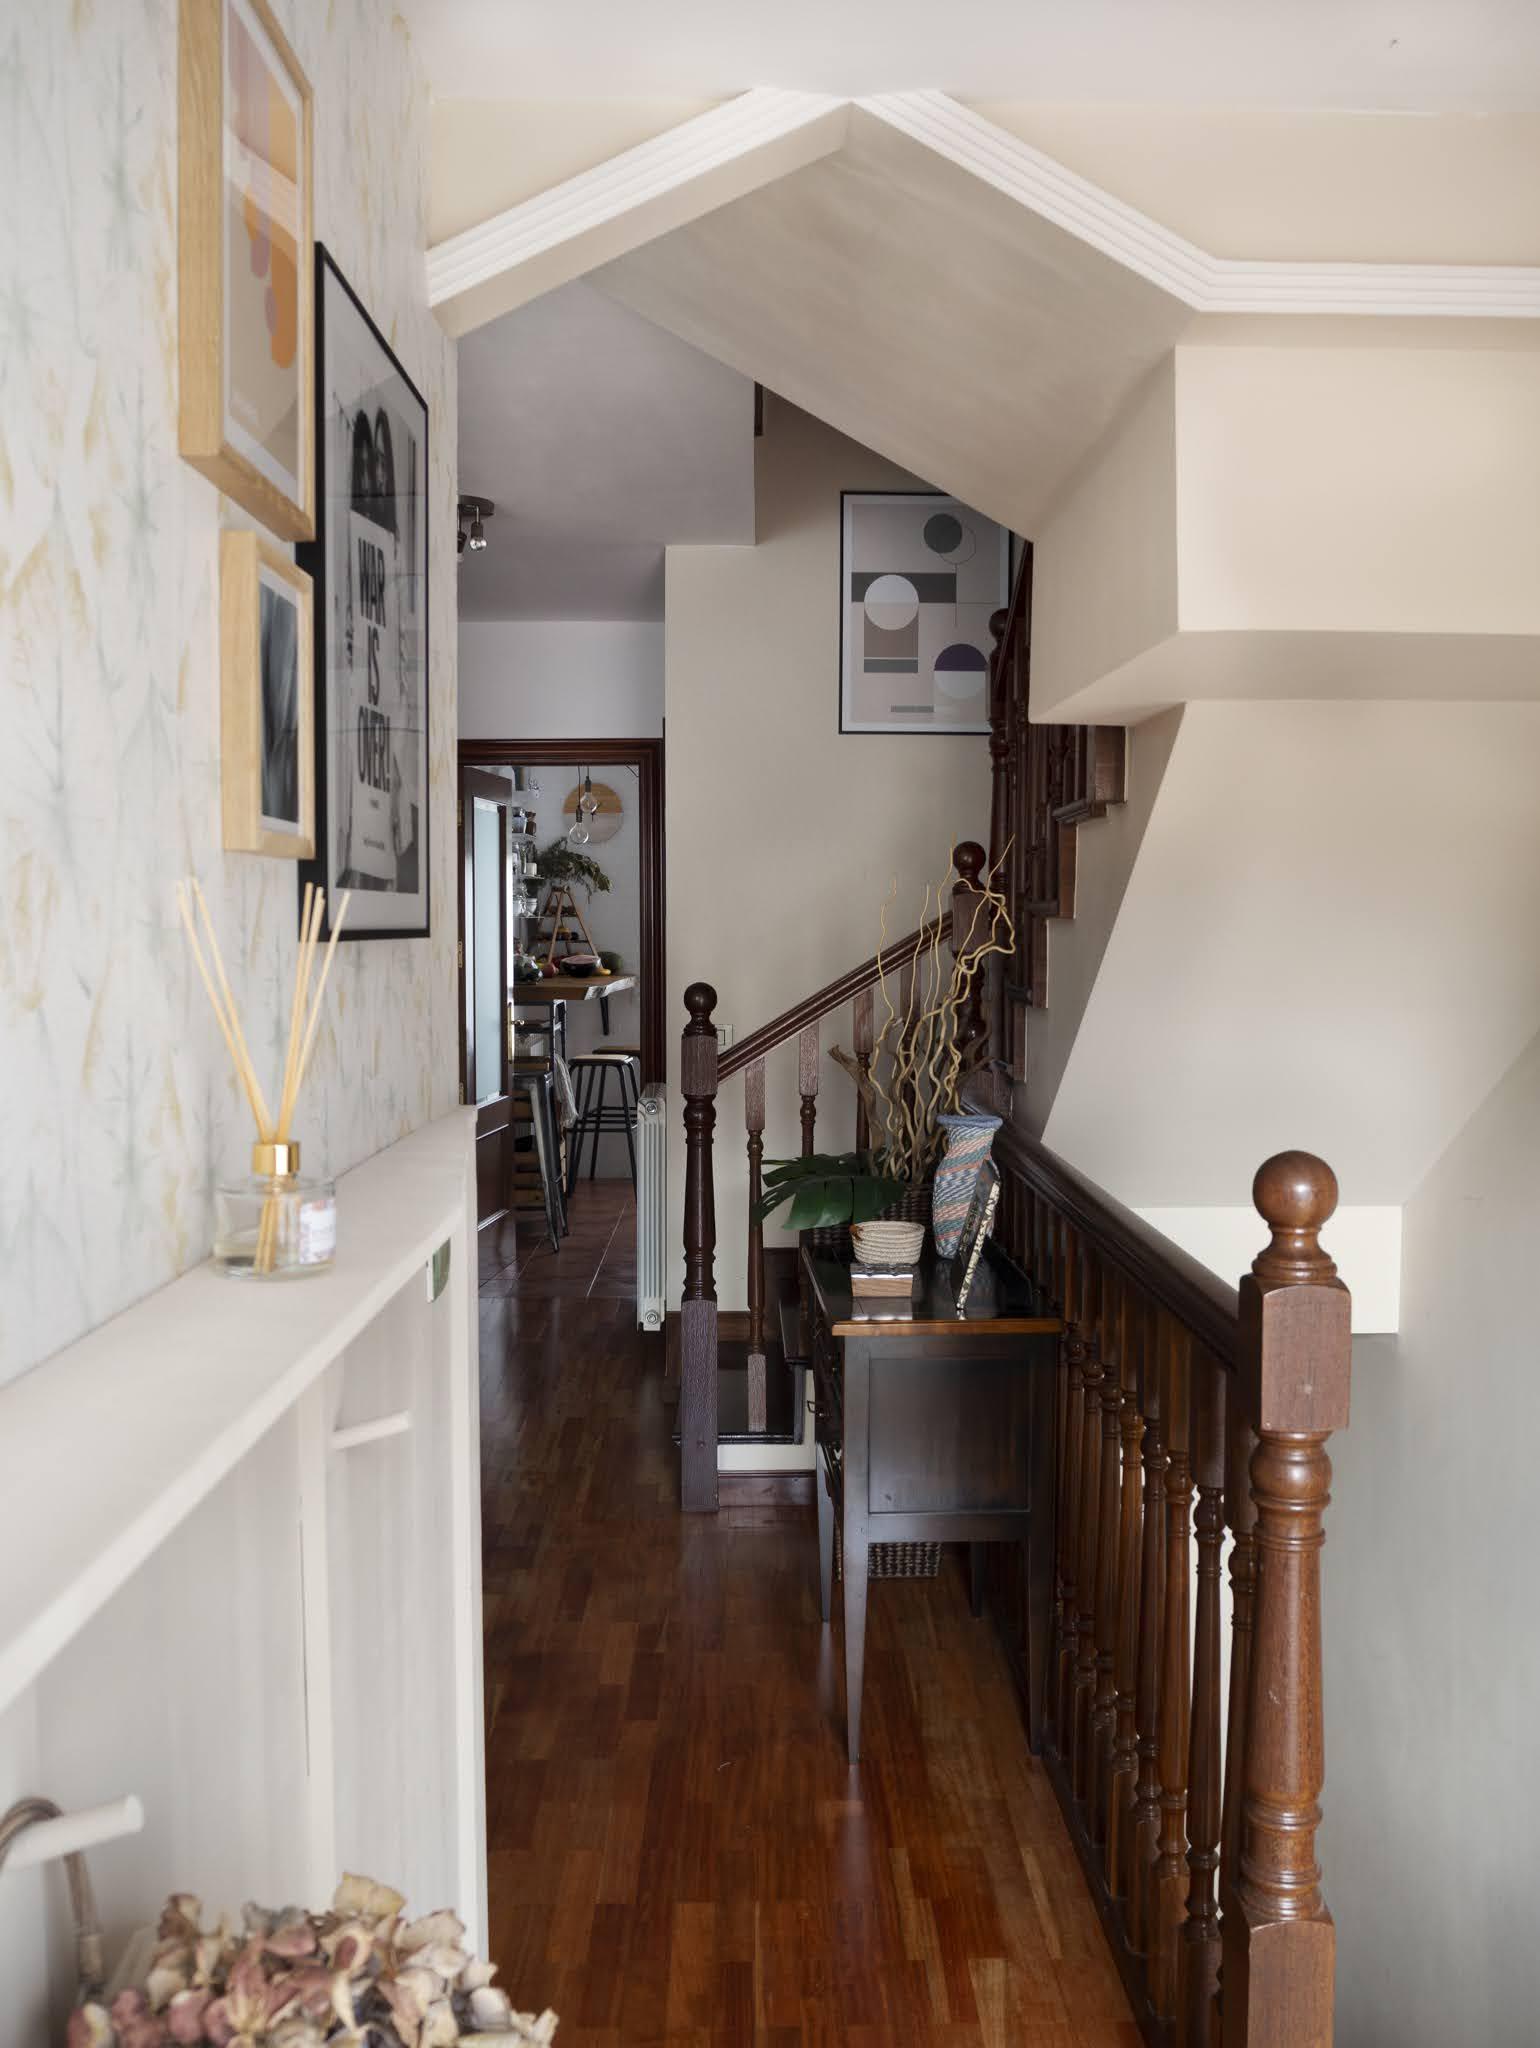 4 trucos para decorar de forma coherente vuestro hogar_10